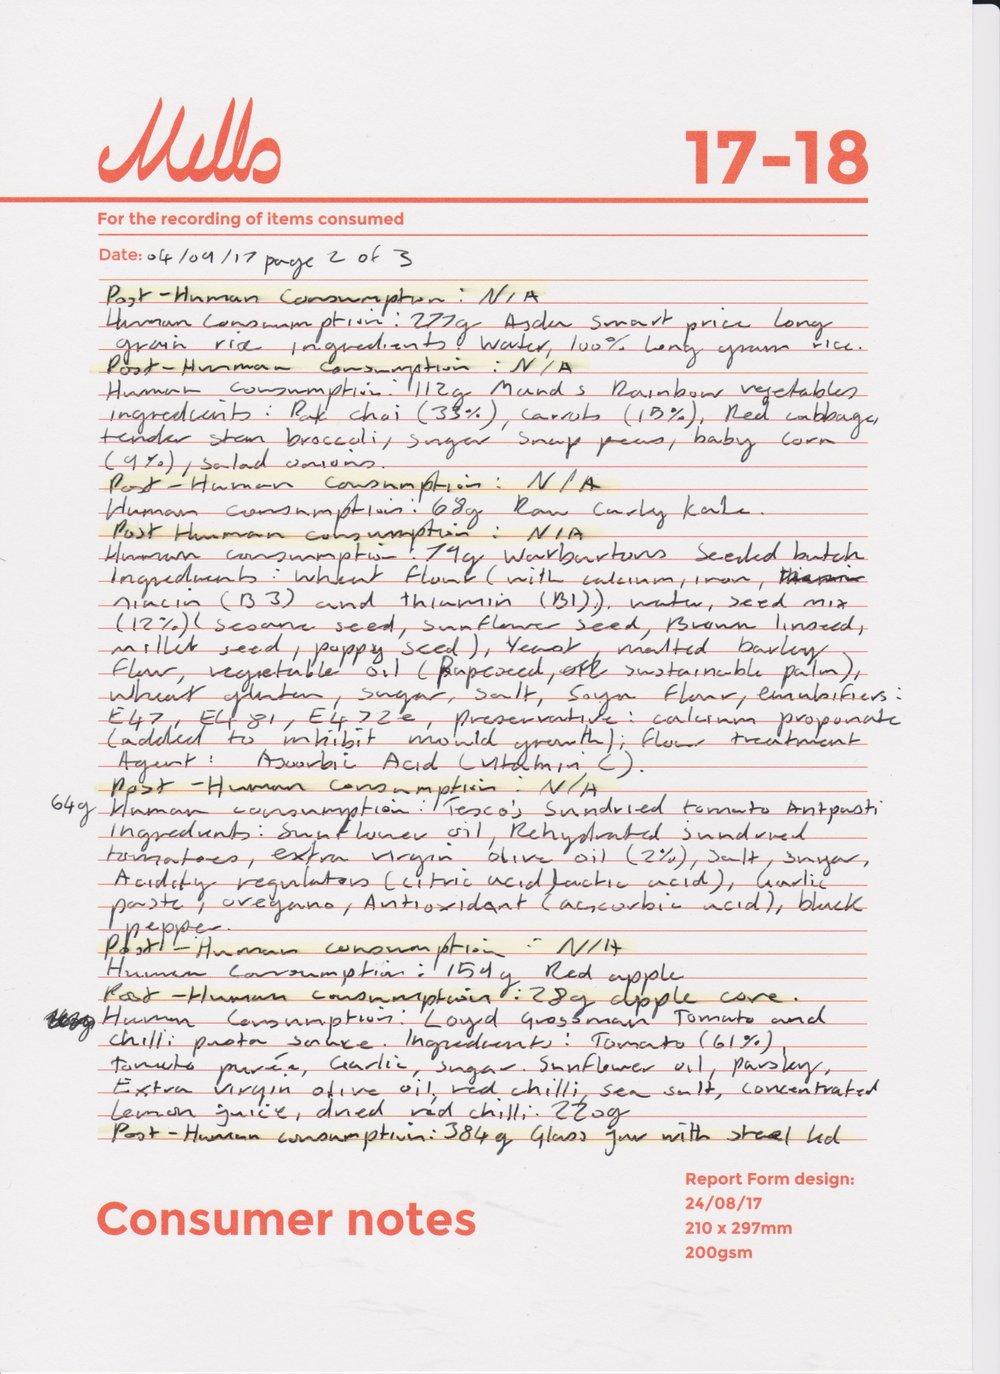 Steven Mills Consumer notes 040917 pg2 of 3.jpeg